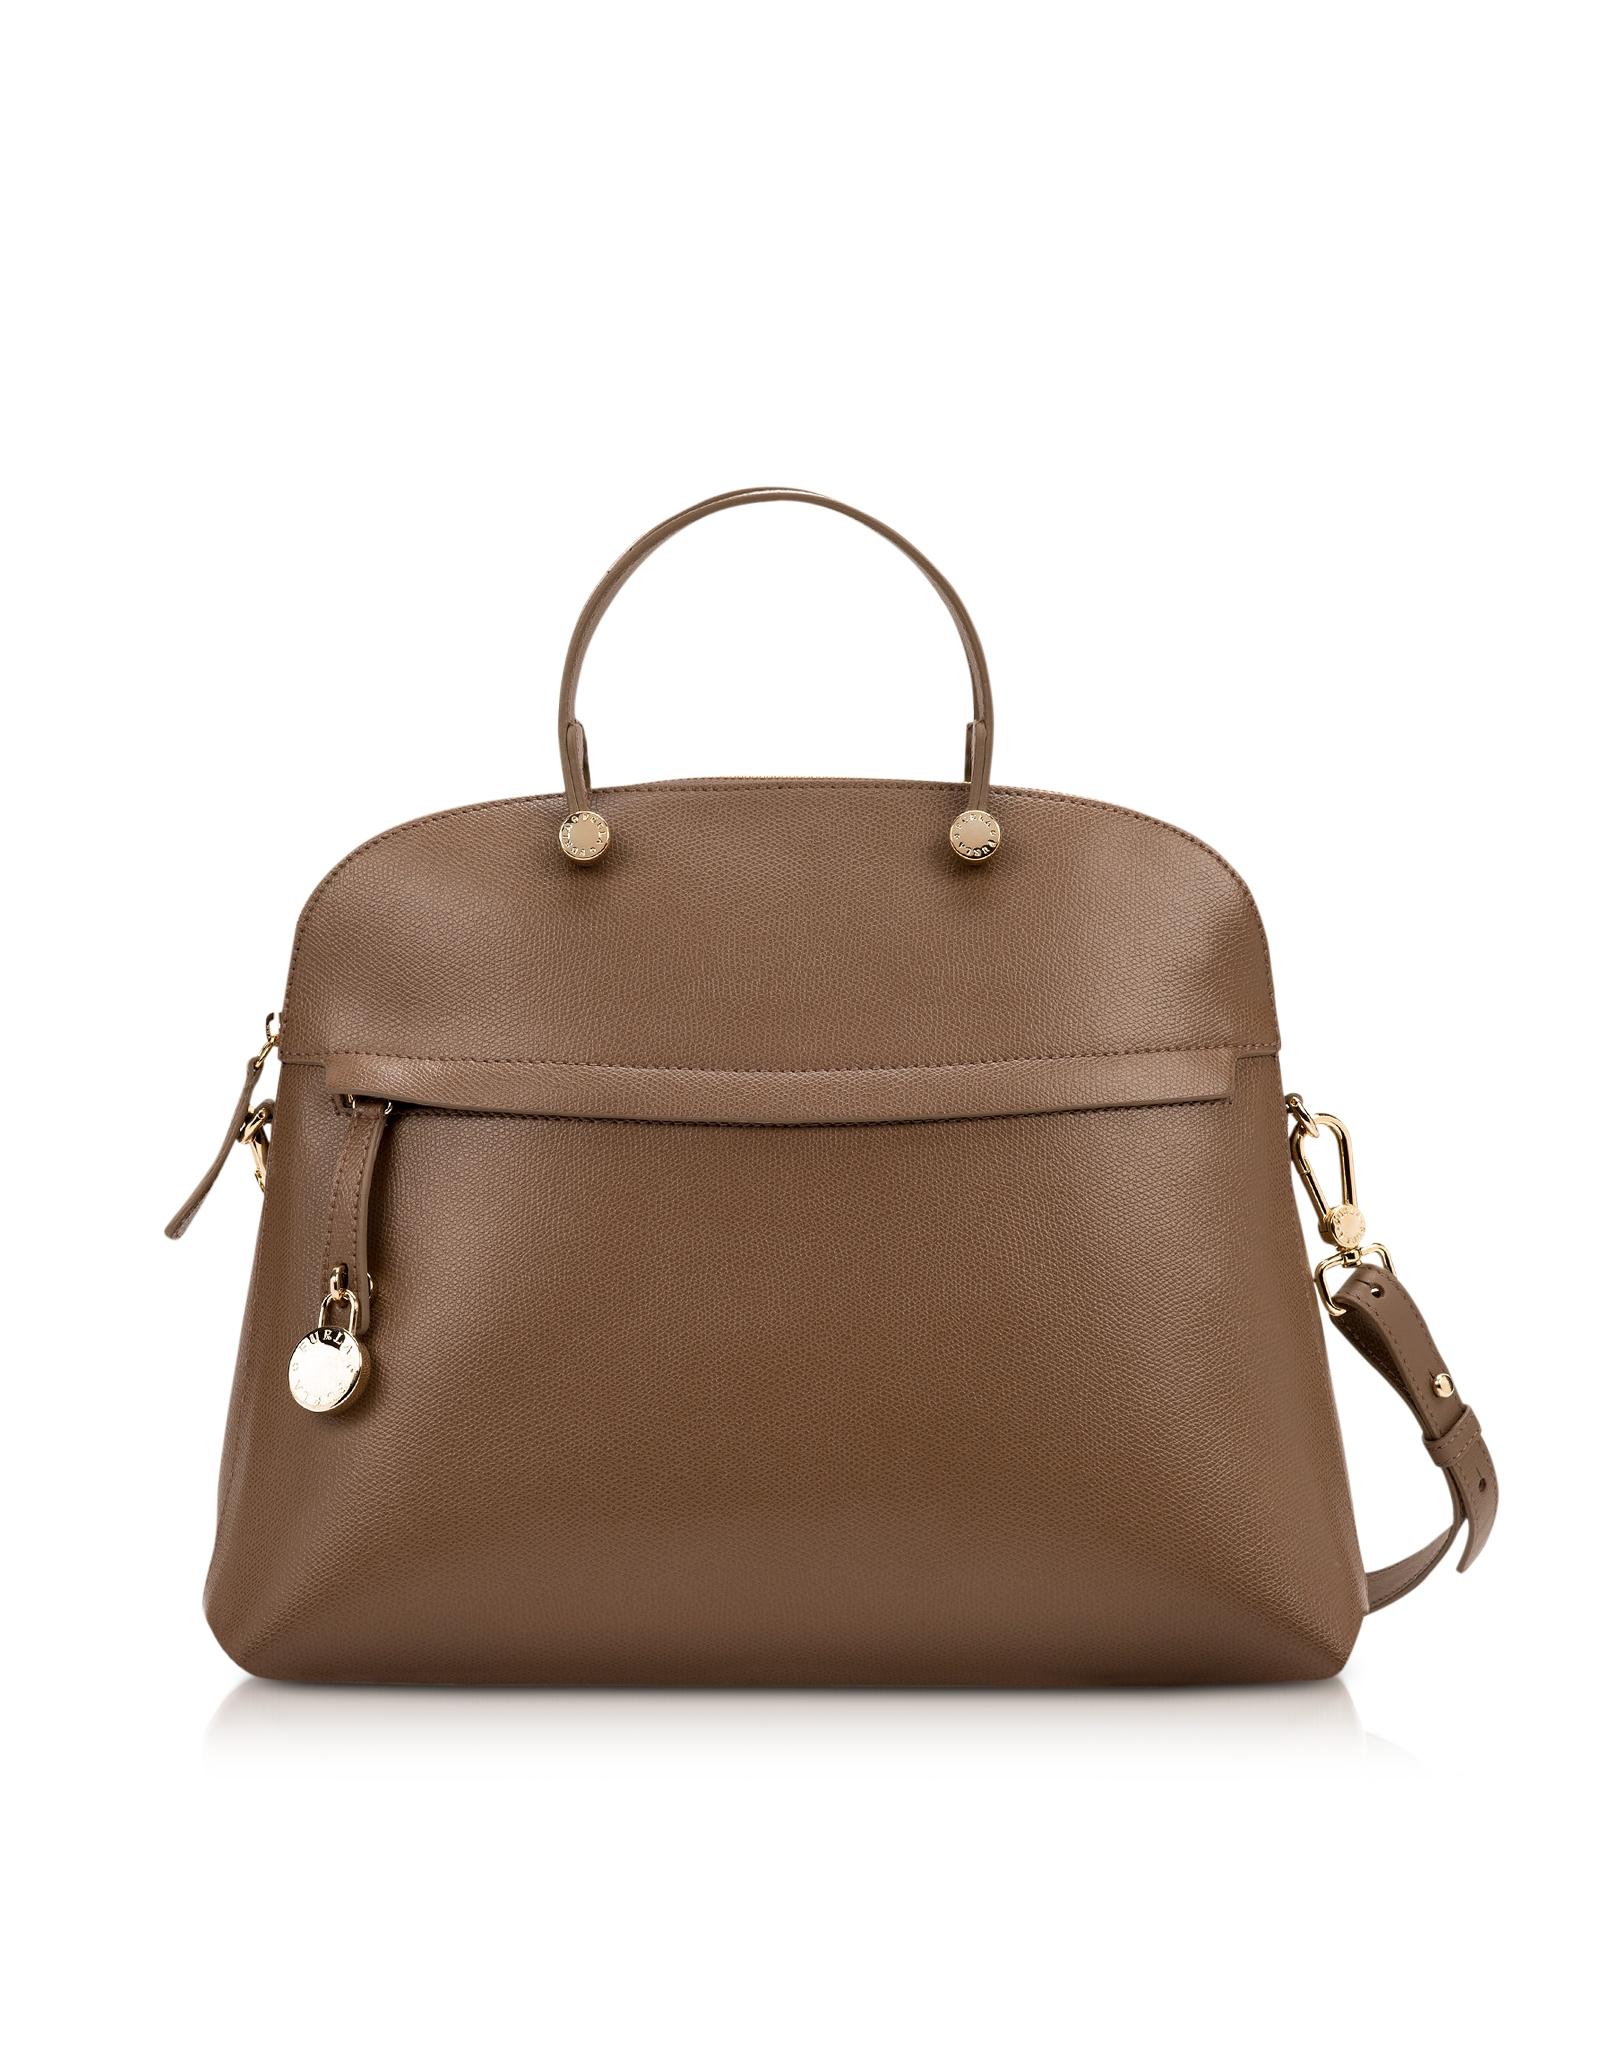 27dc5667d76df Lyst - Furla Piper Daino Medium Leather Dome Bag in Metallic